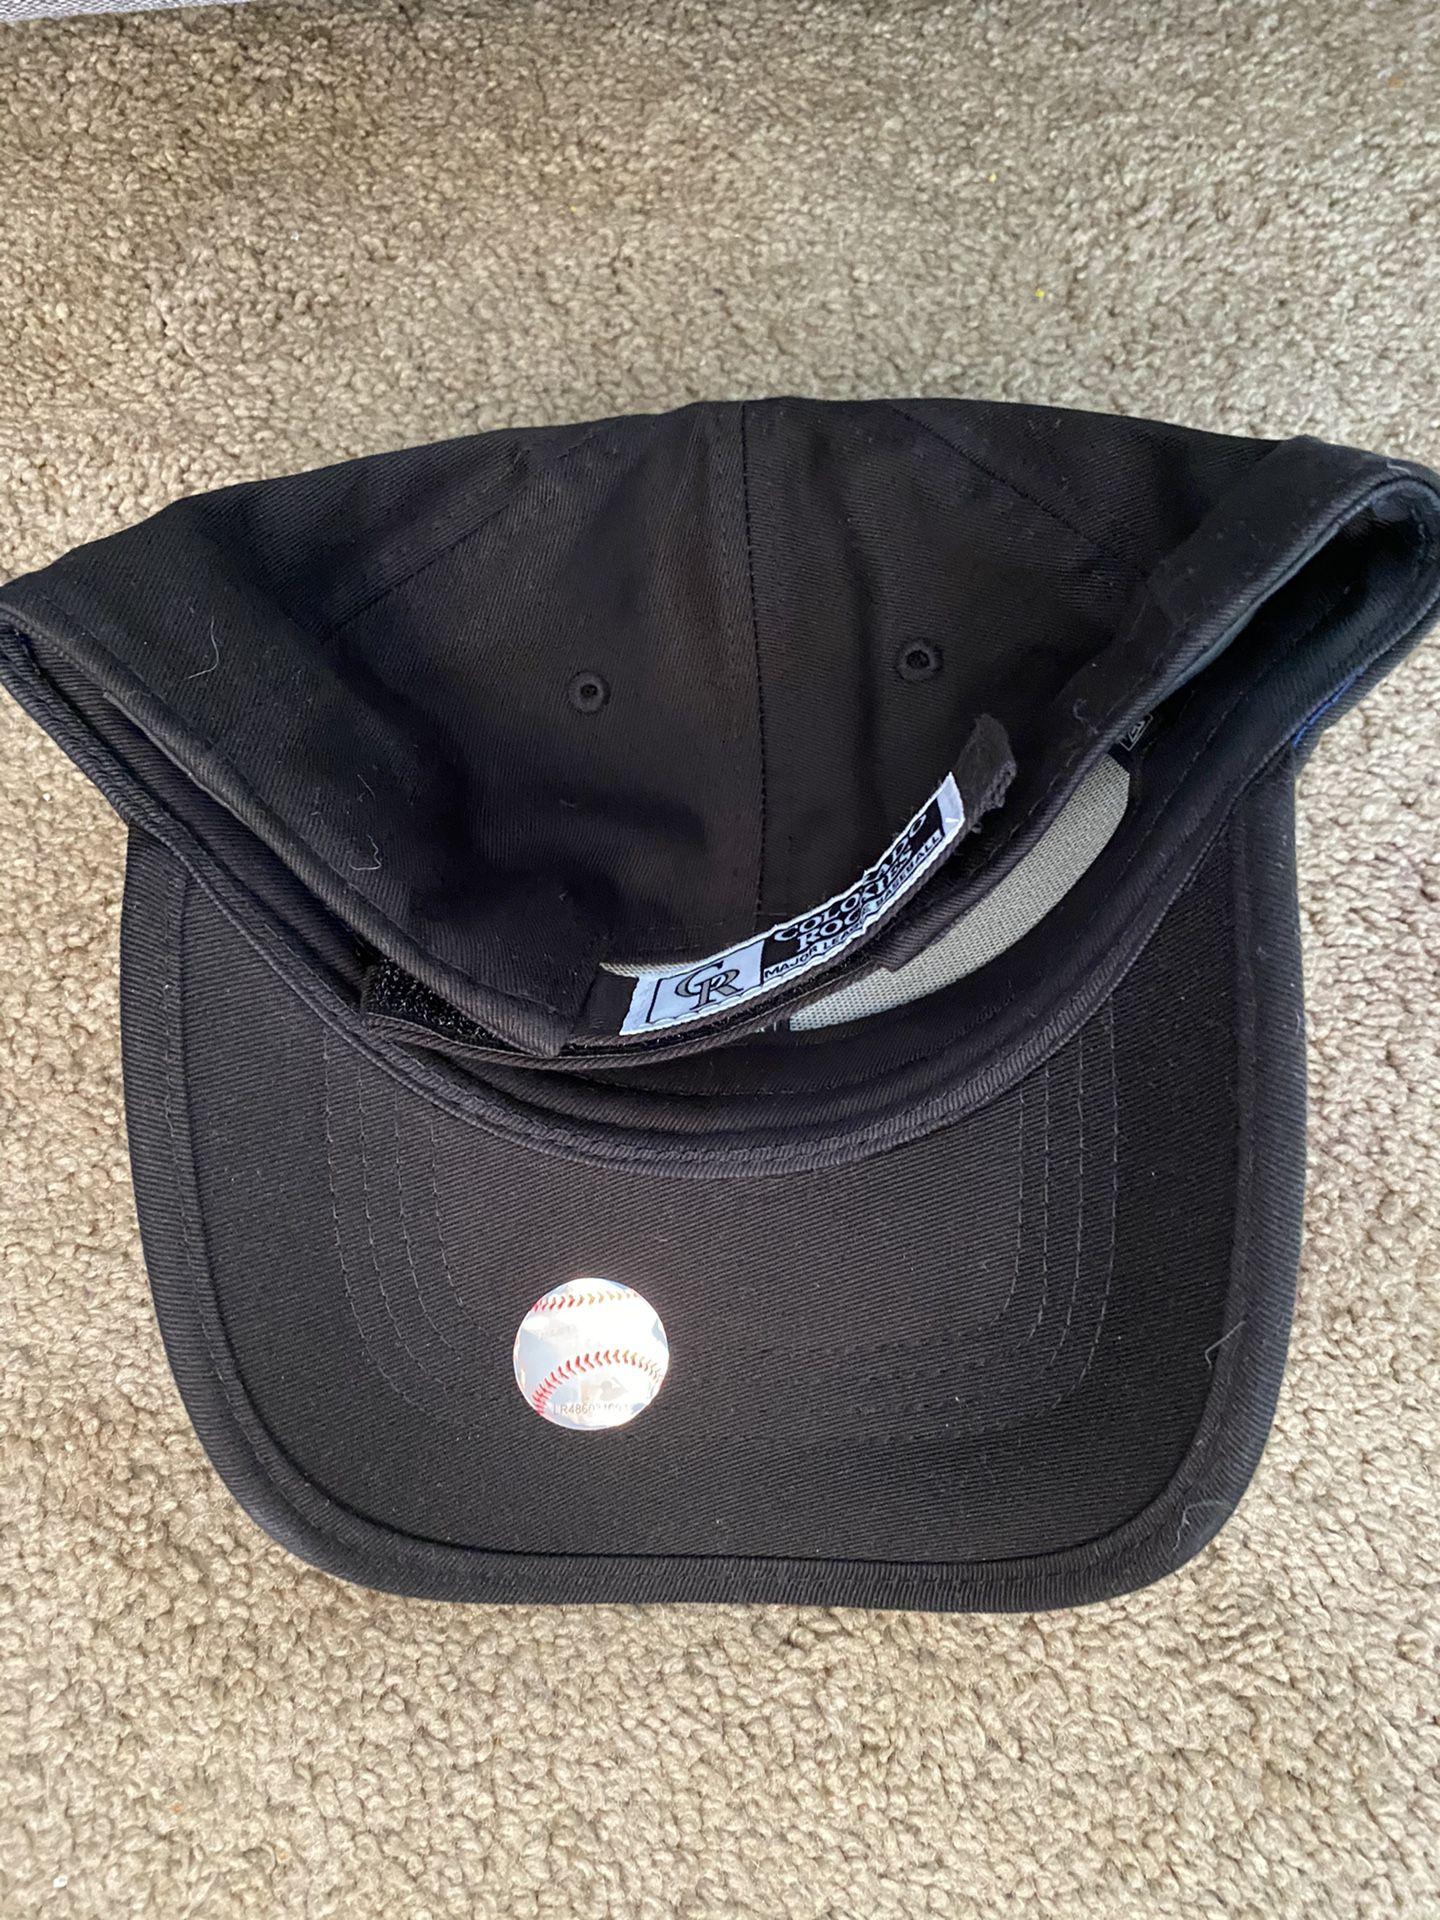 TC SnapBack 🧢 $17